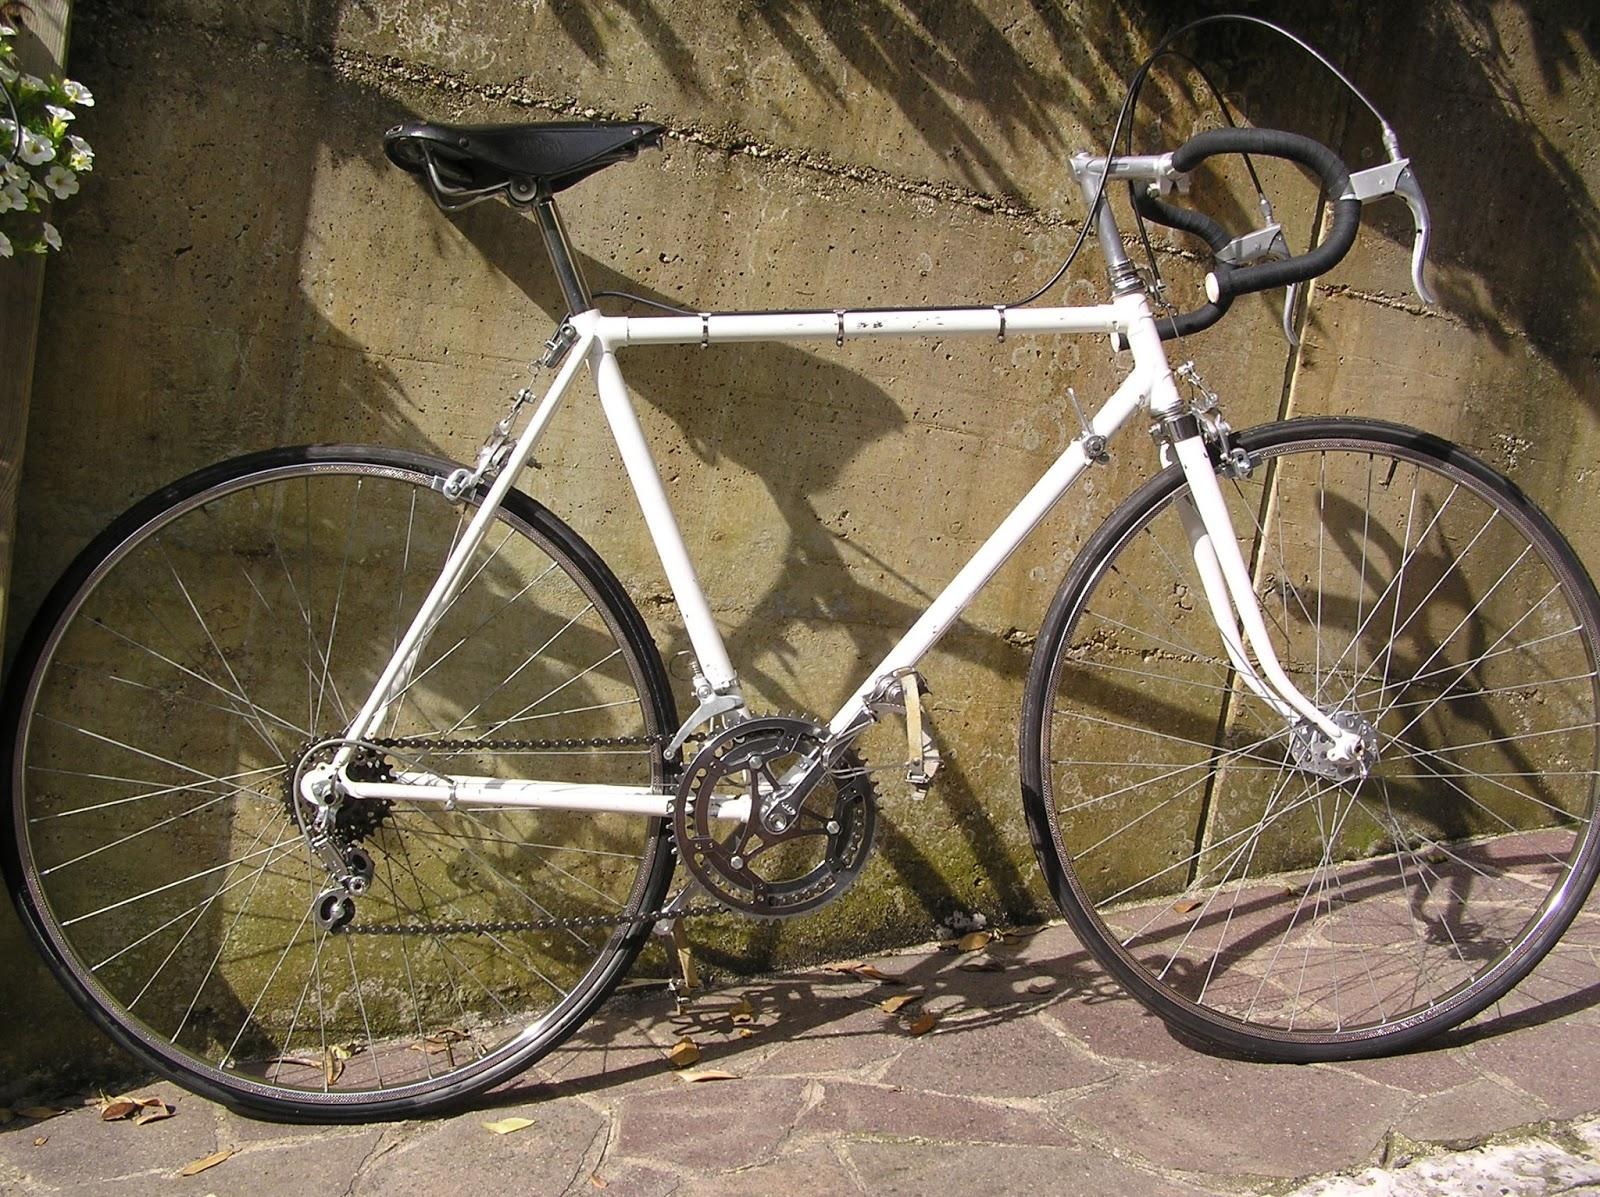 Custom Original Bike Used Cob Used Bici Vintage Originale Del